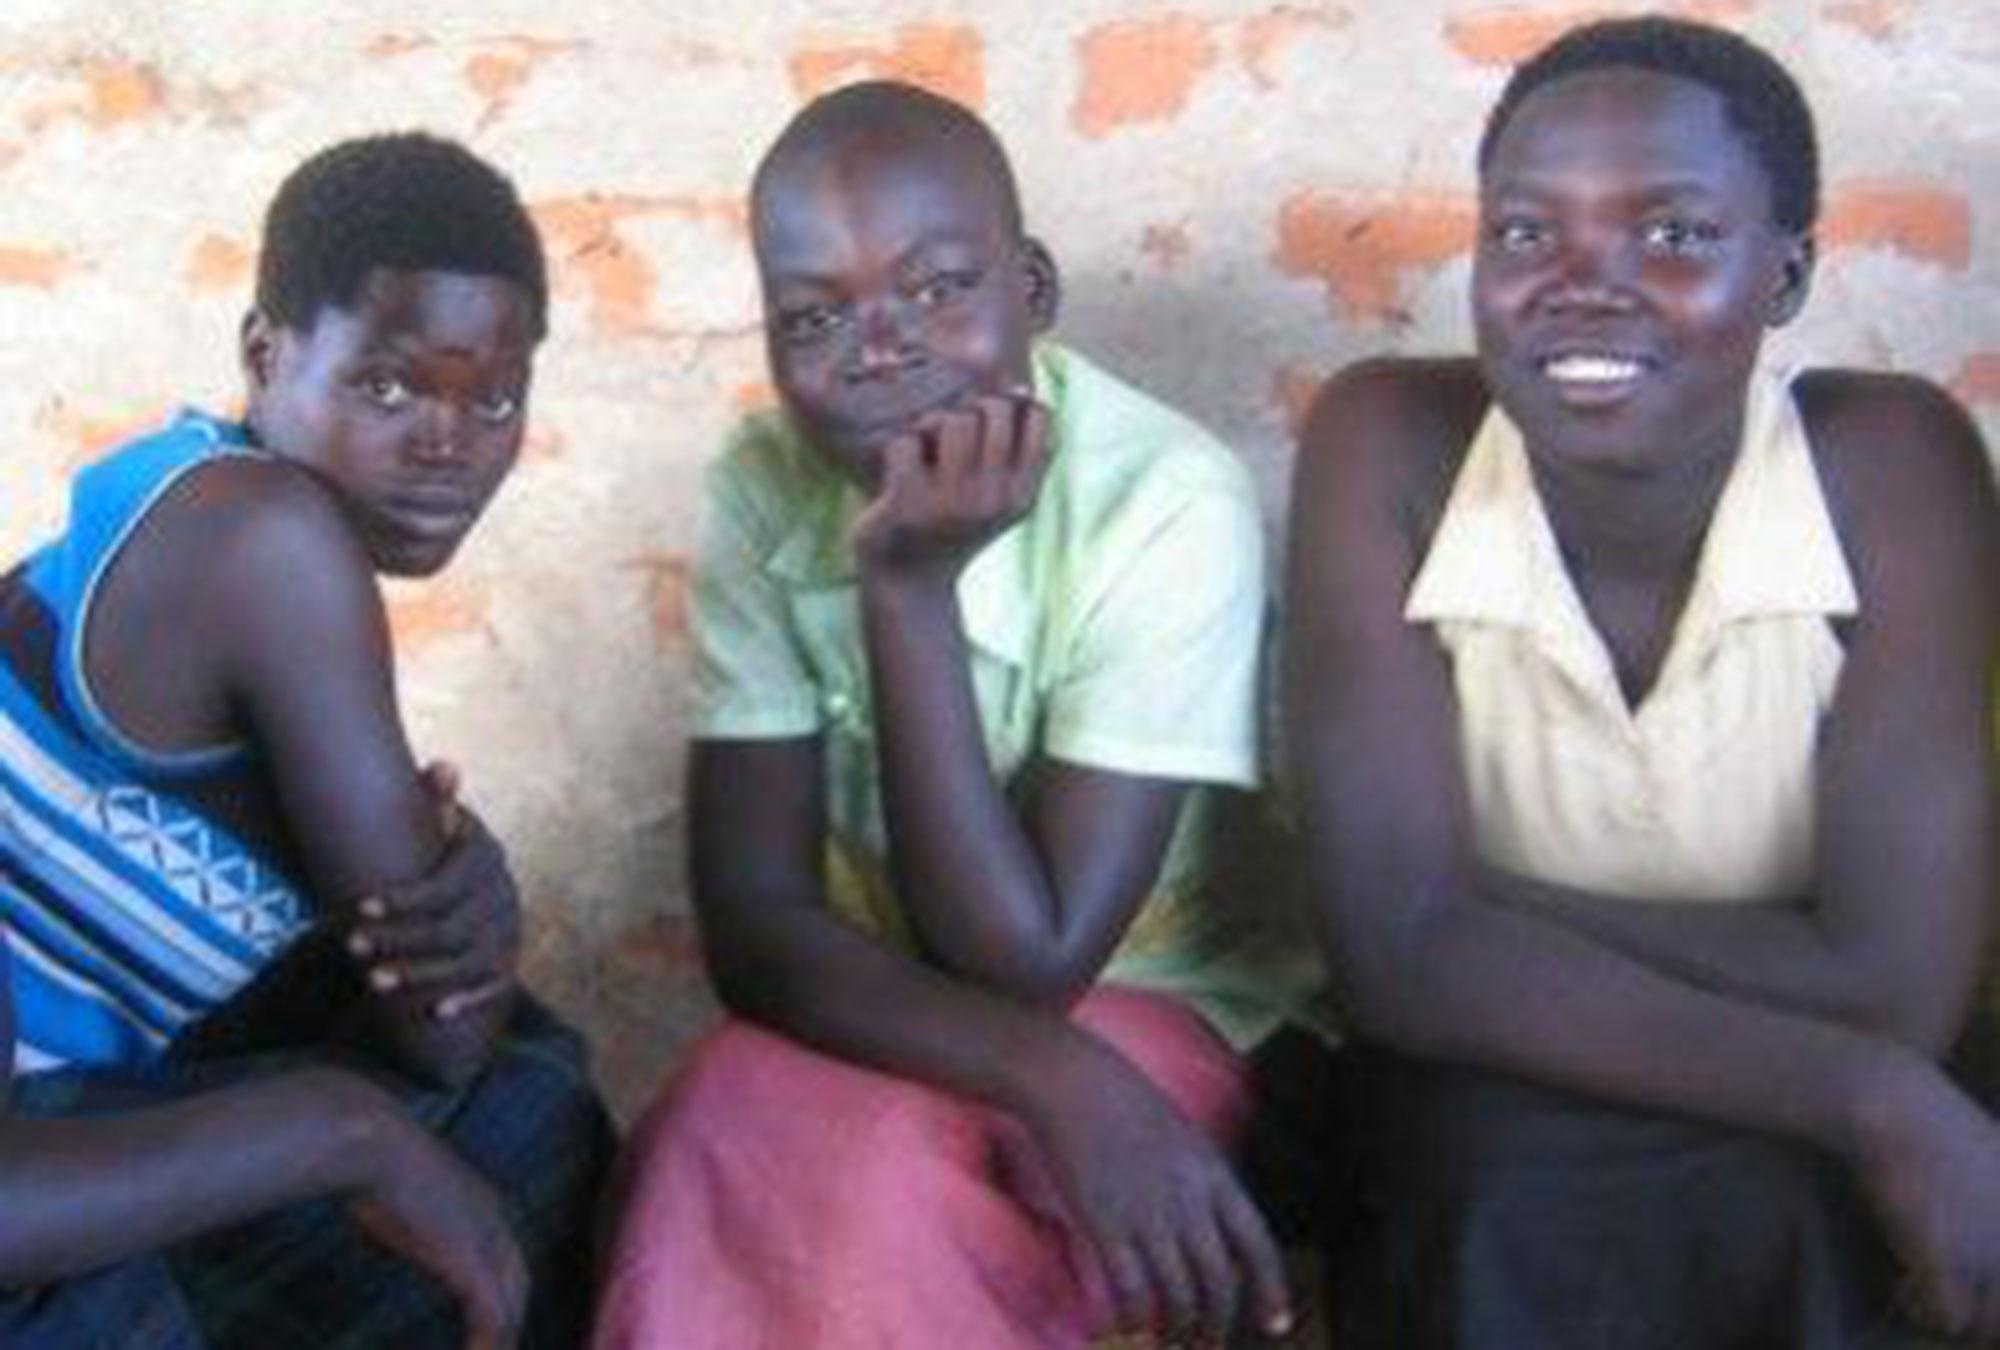 Adolescent girls in northern Uganda